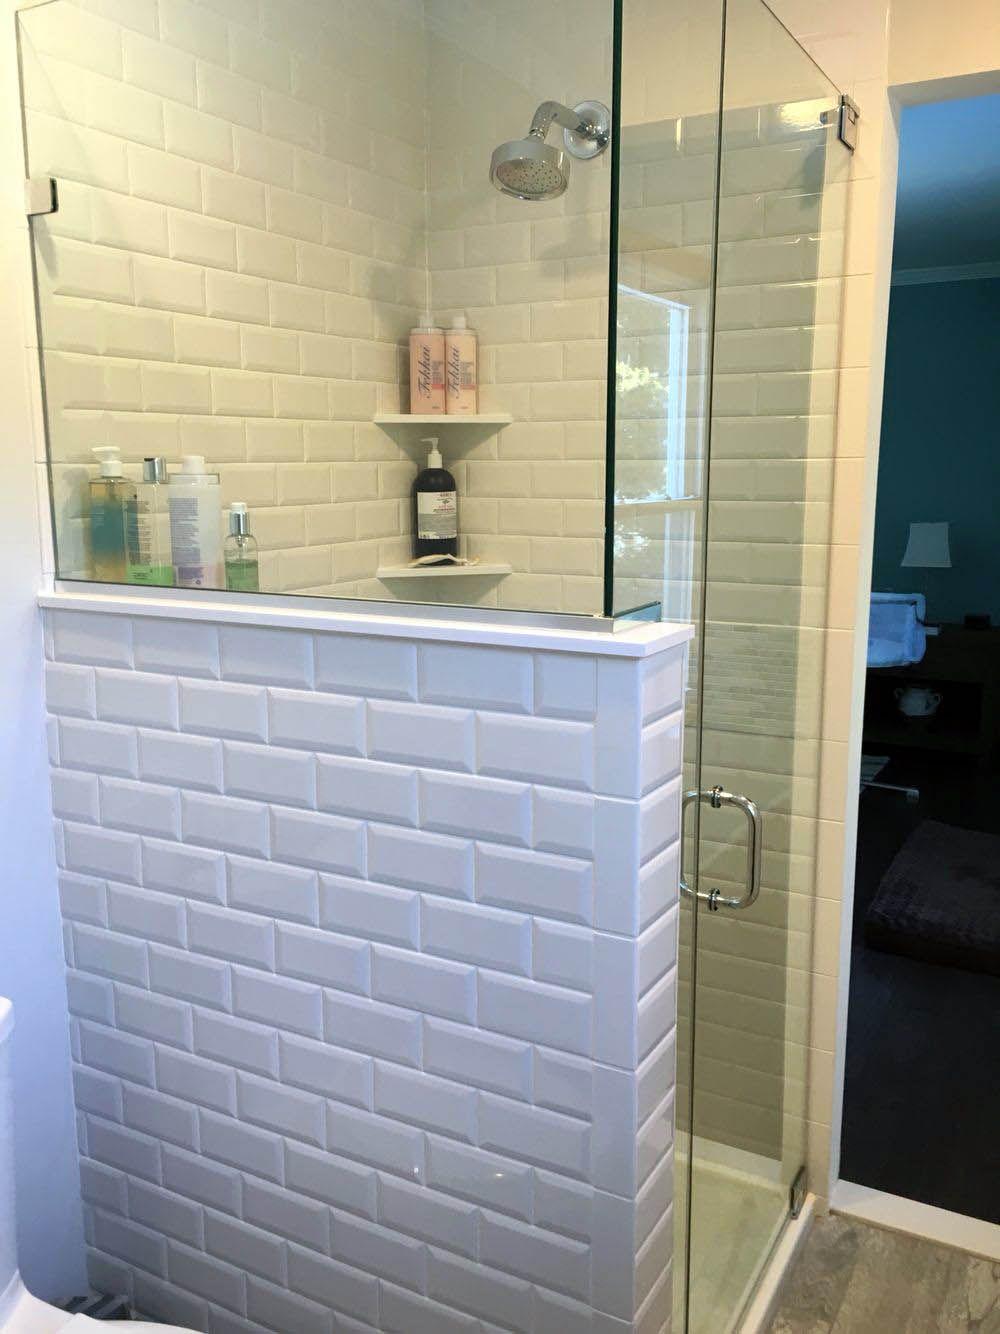 extraordinary bathroom design tile showers ideas | Extraordinary shower tile ideas 2015 exclusive on indoneso ...